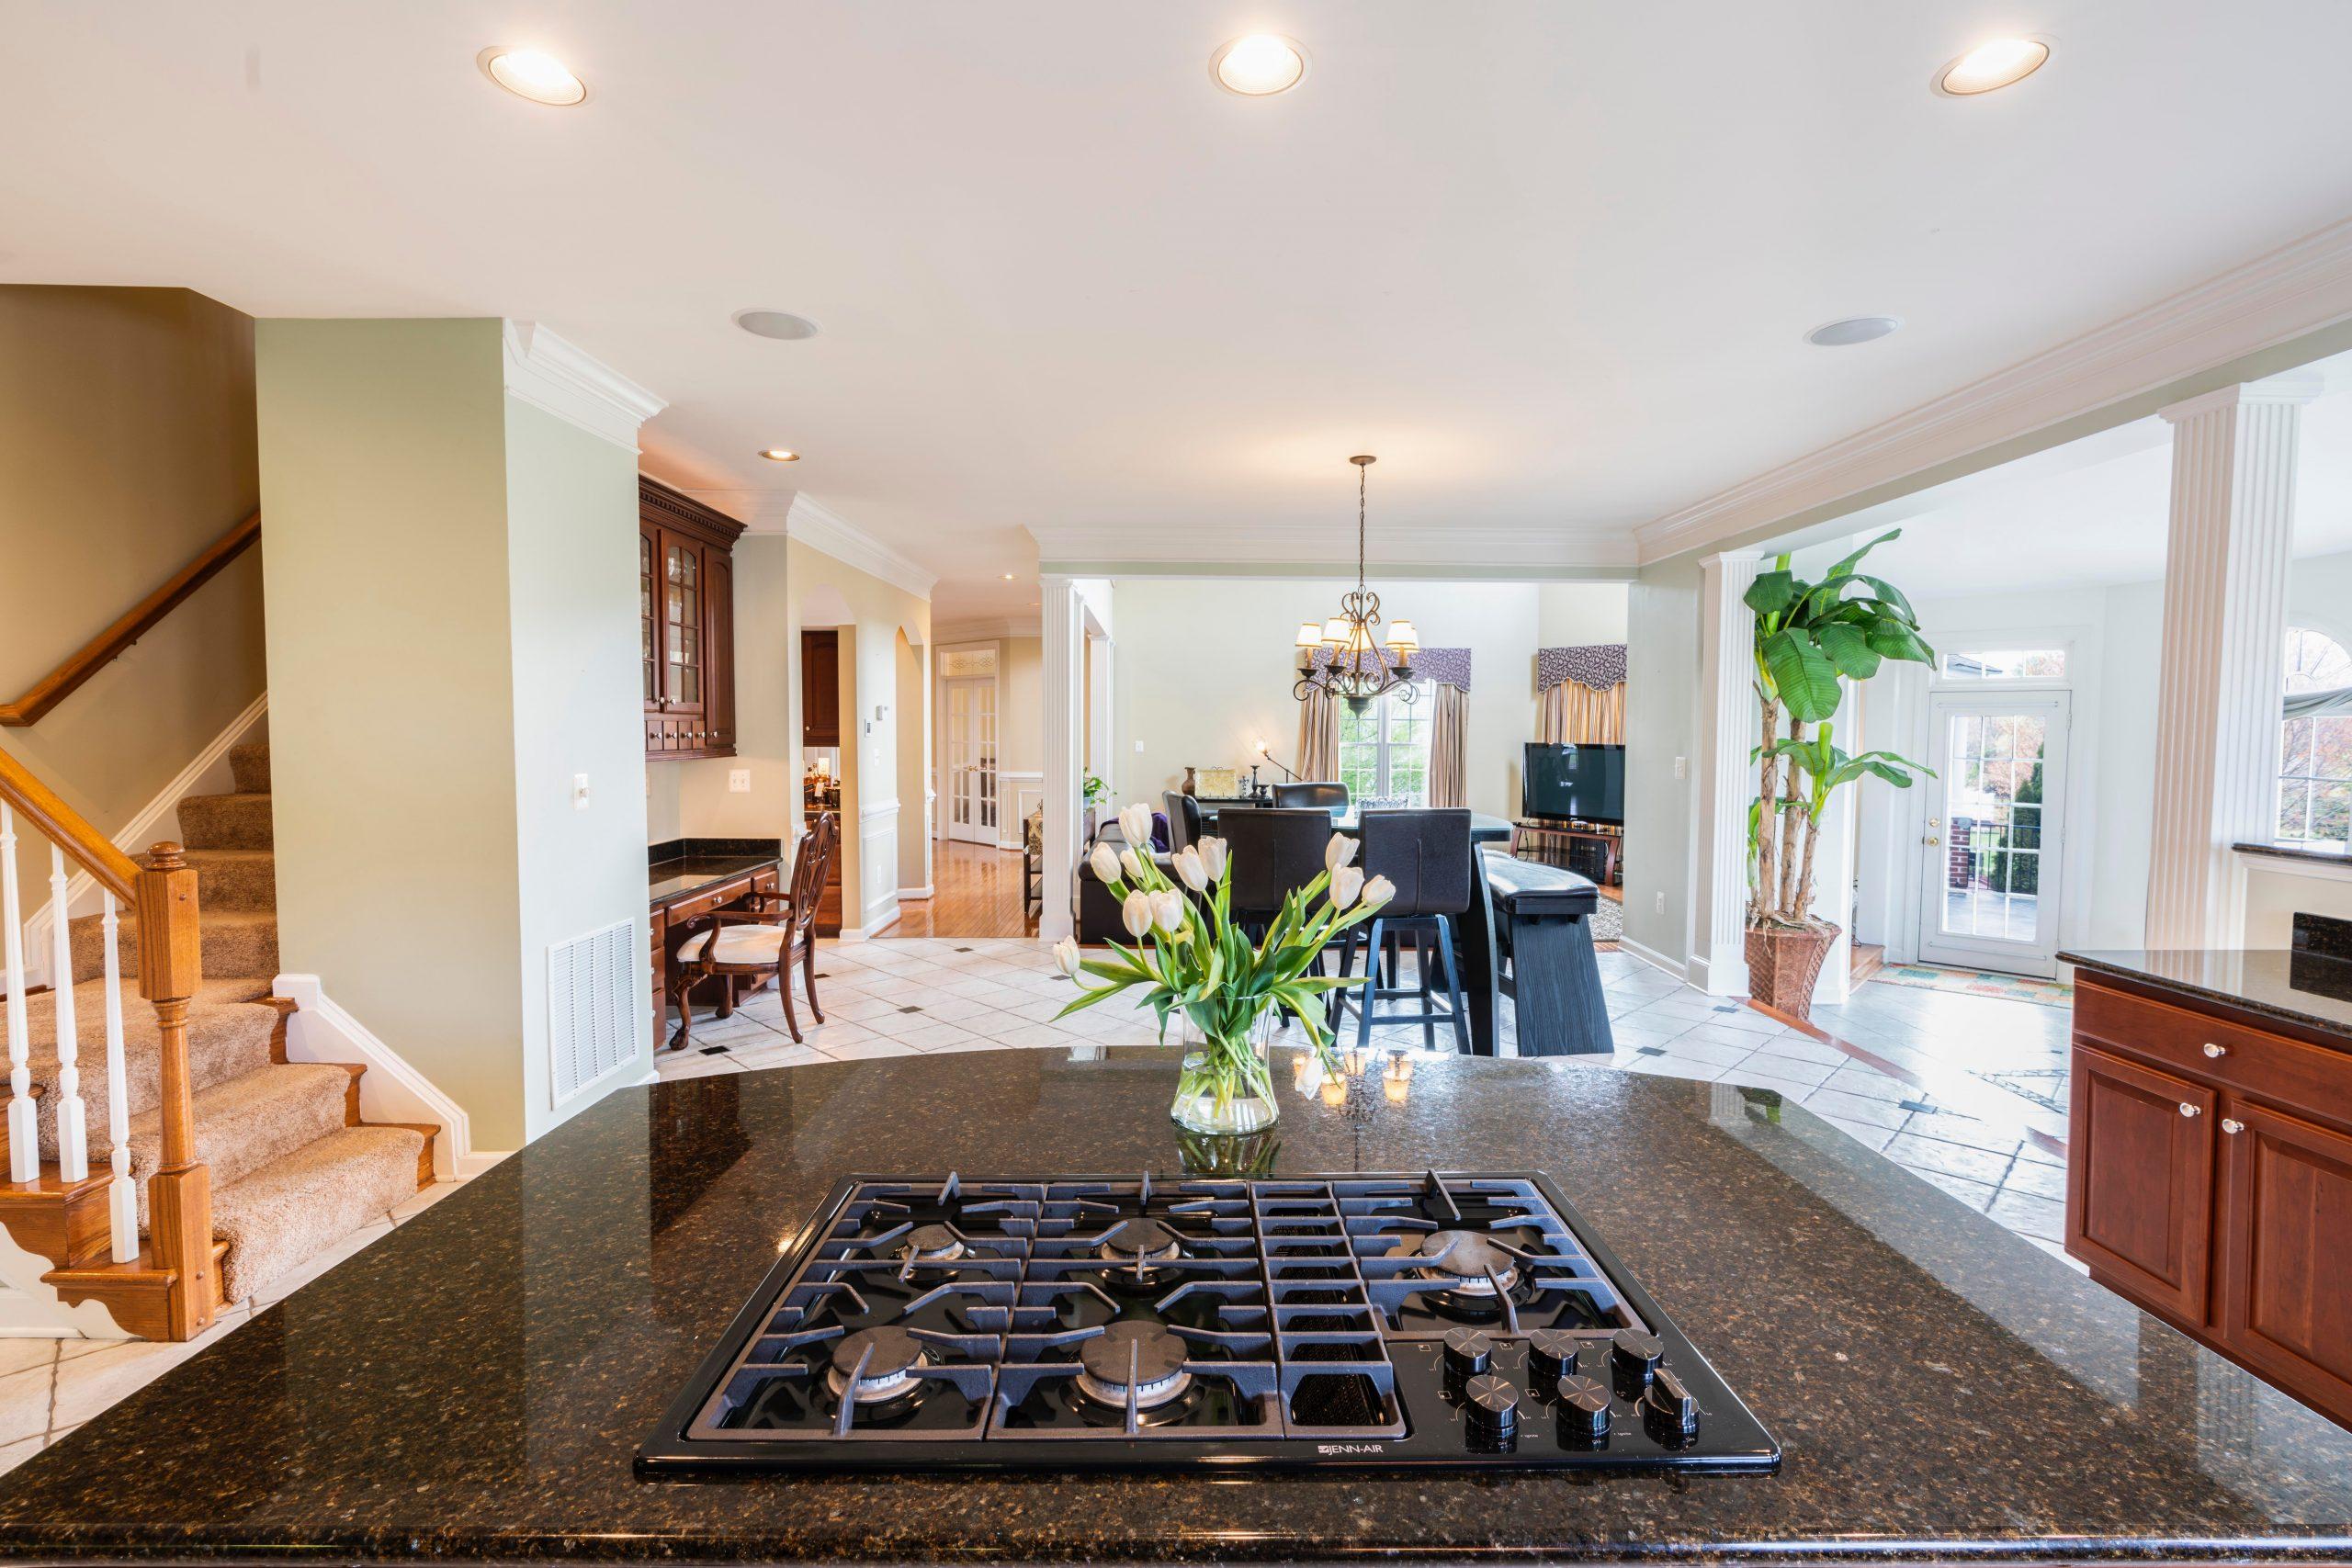 Immobilier - Investir dans le neuf